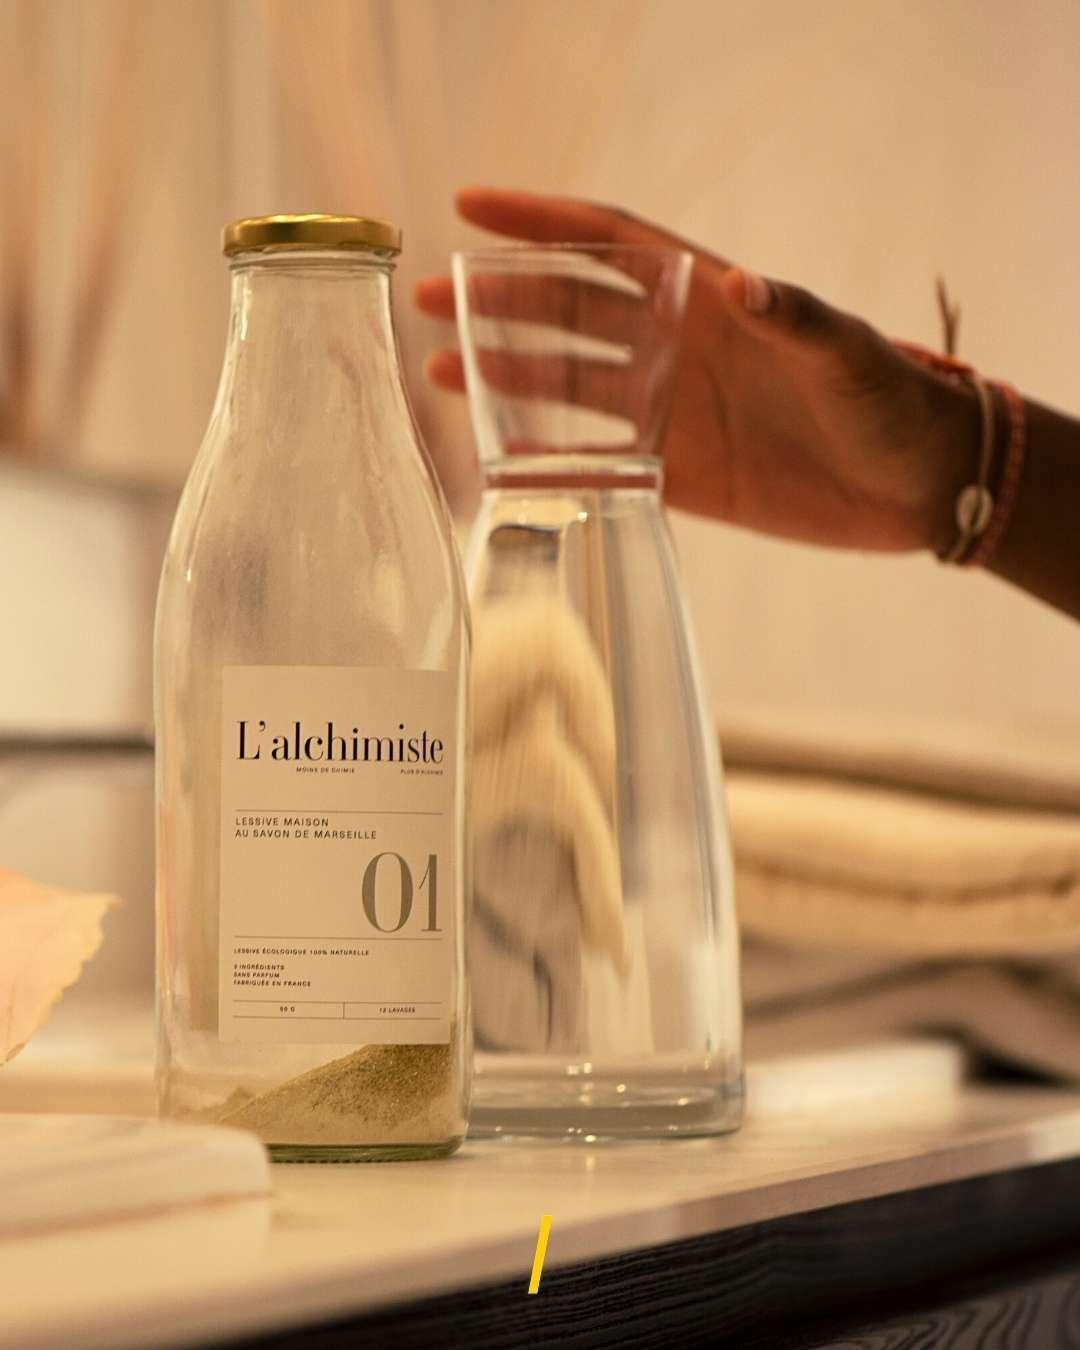 La lessive liquide naturelle - L'alchimiste